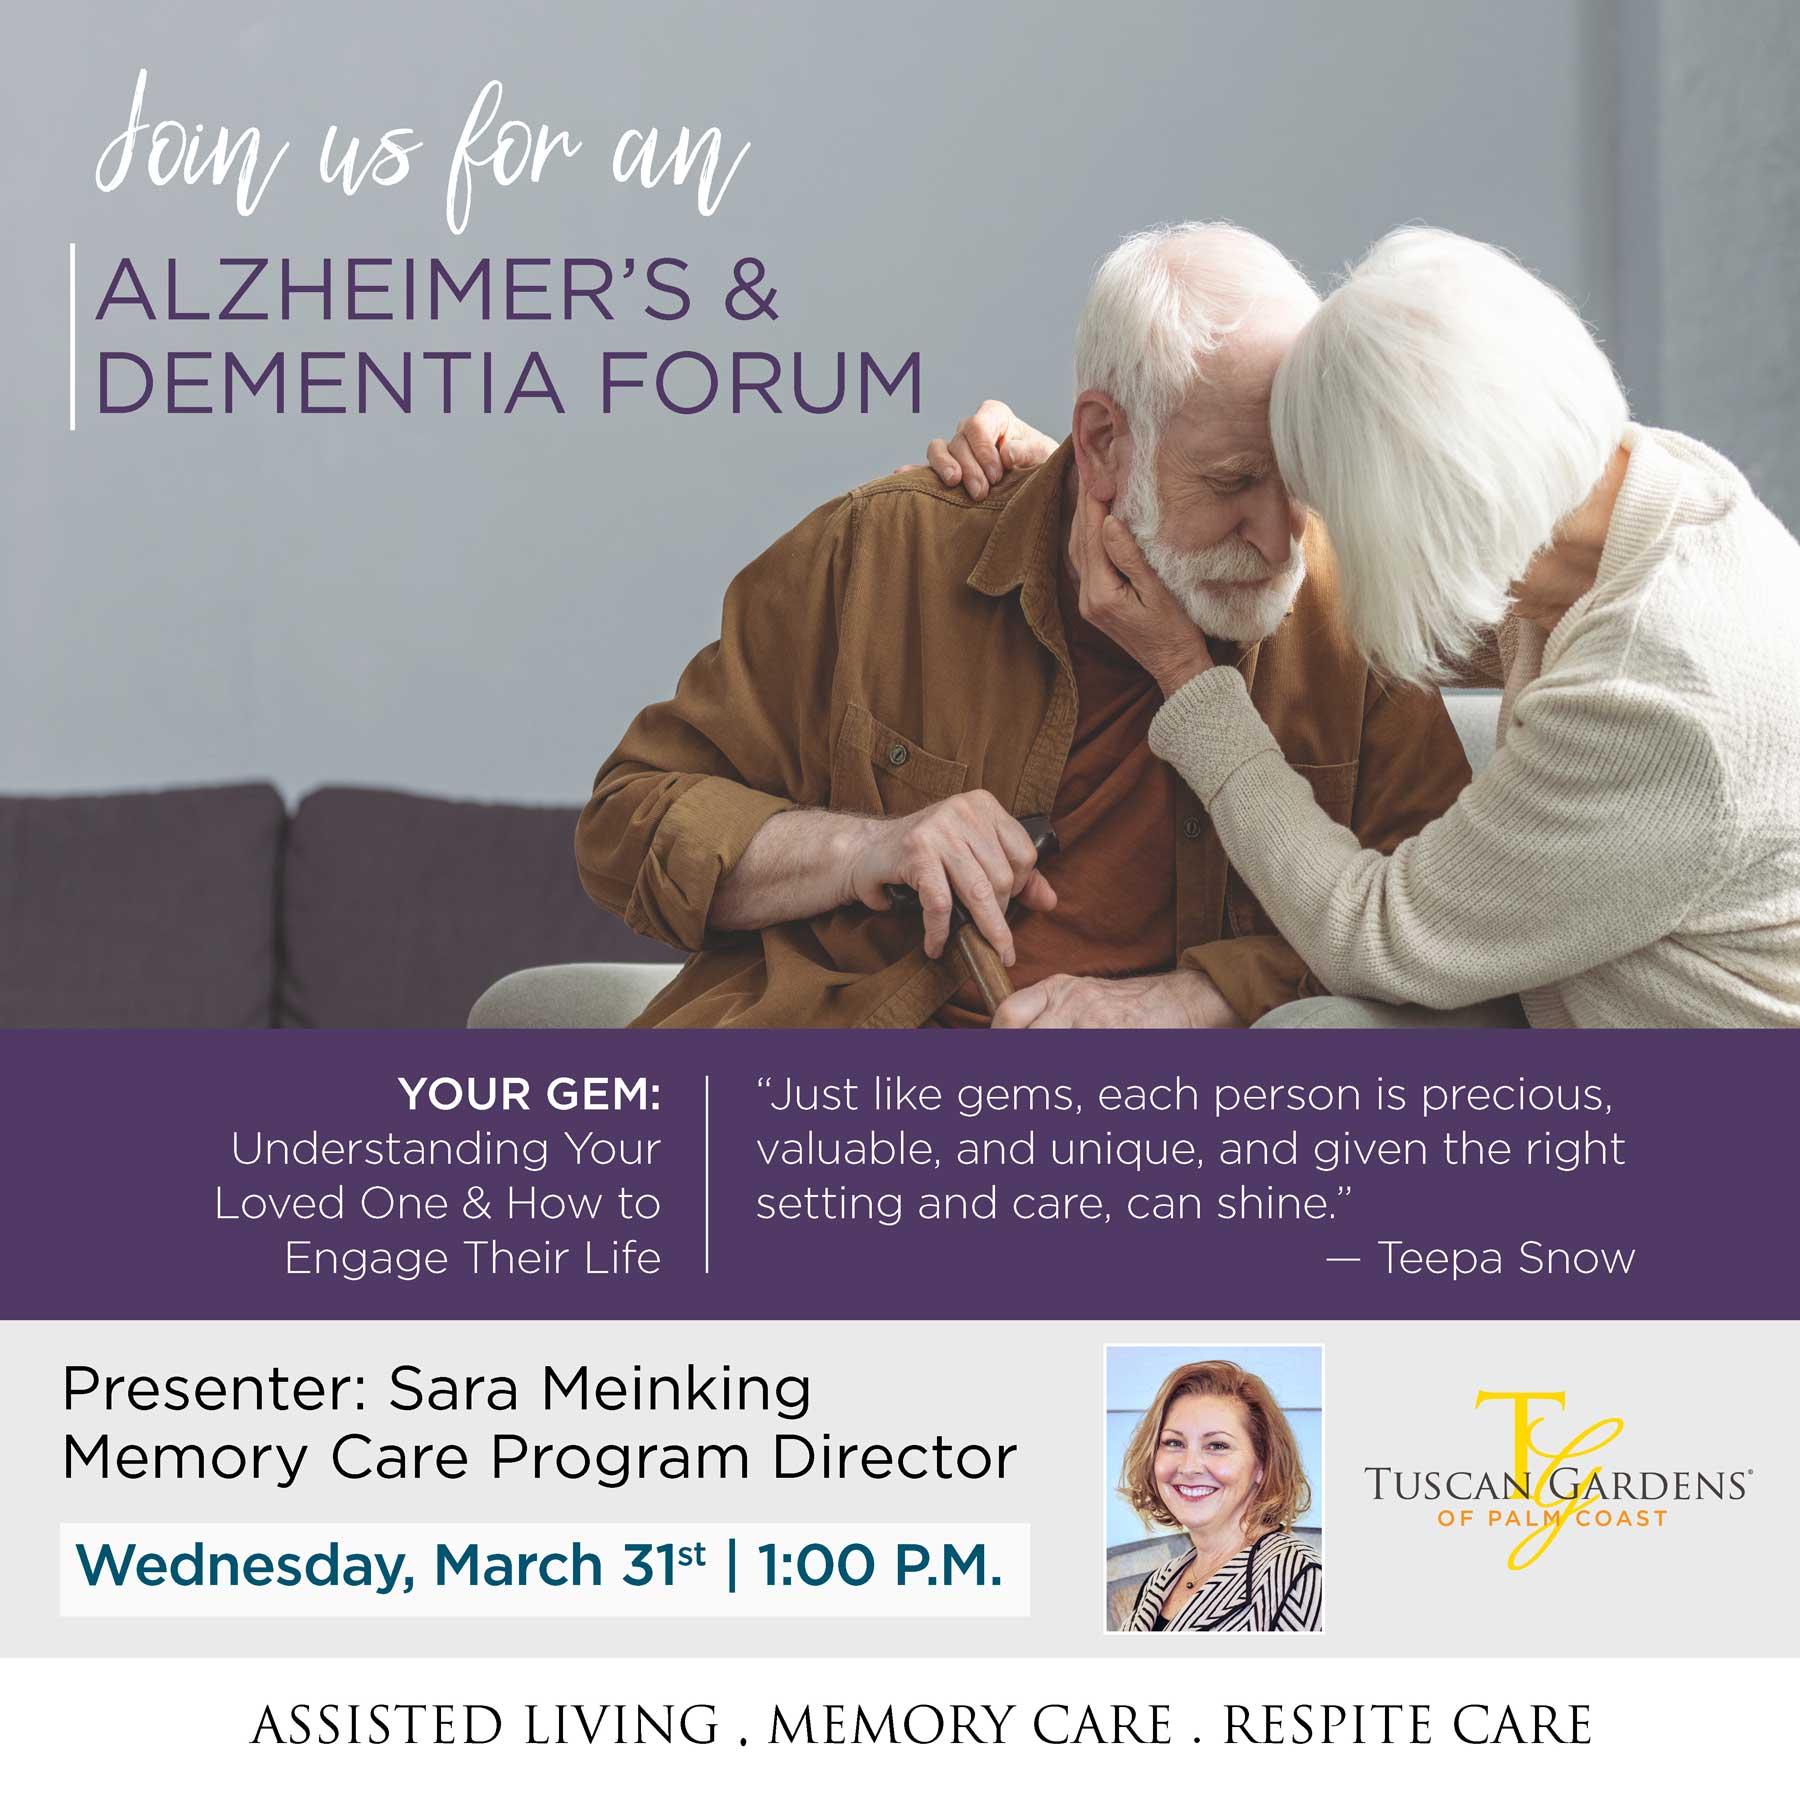 Alzheimer's and Dementia Forum